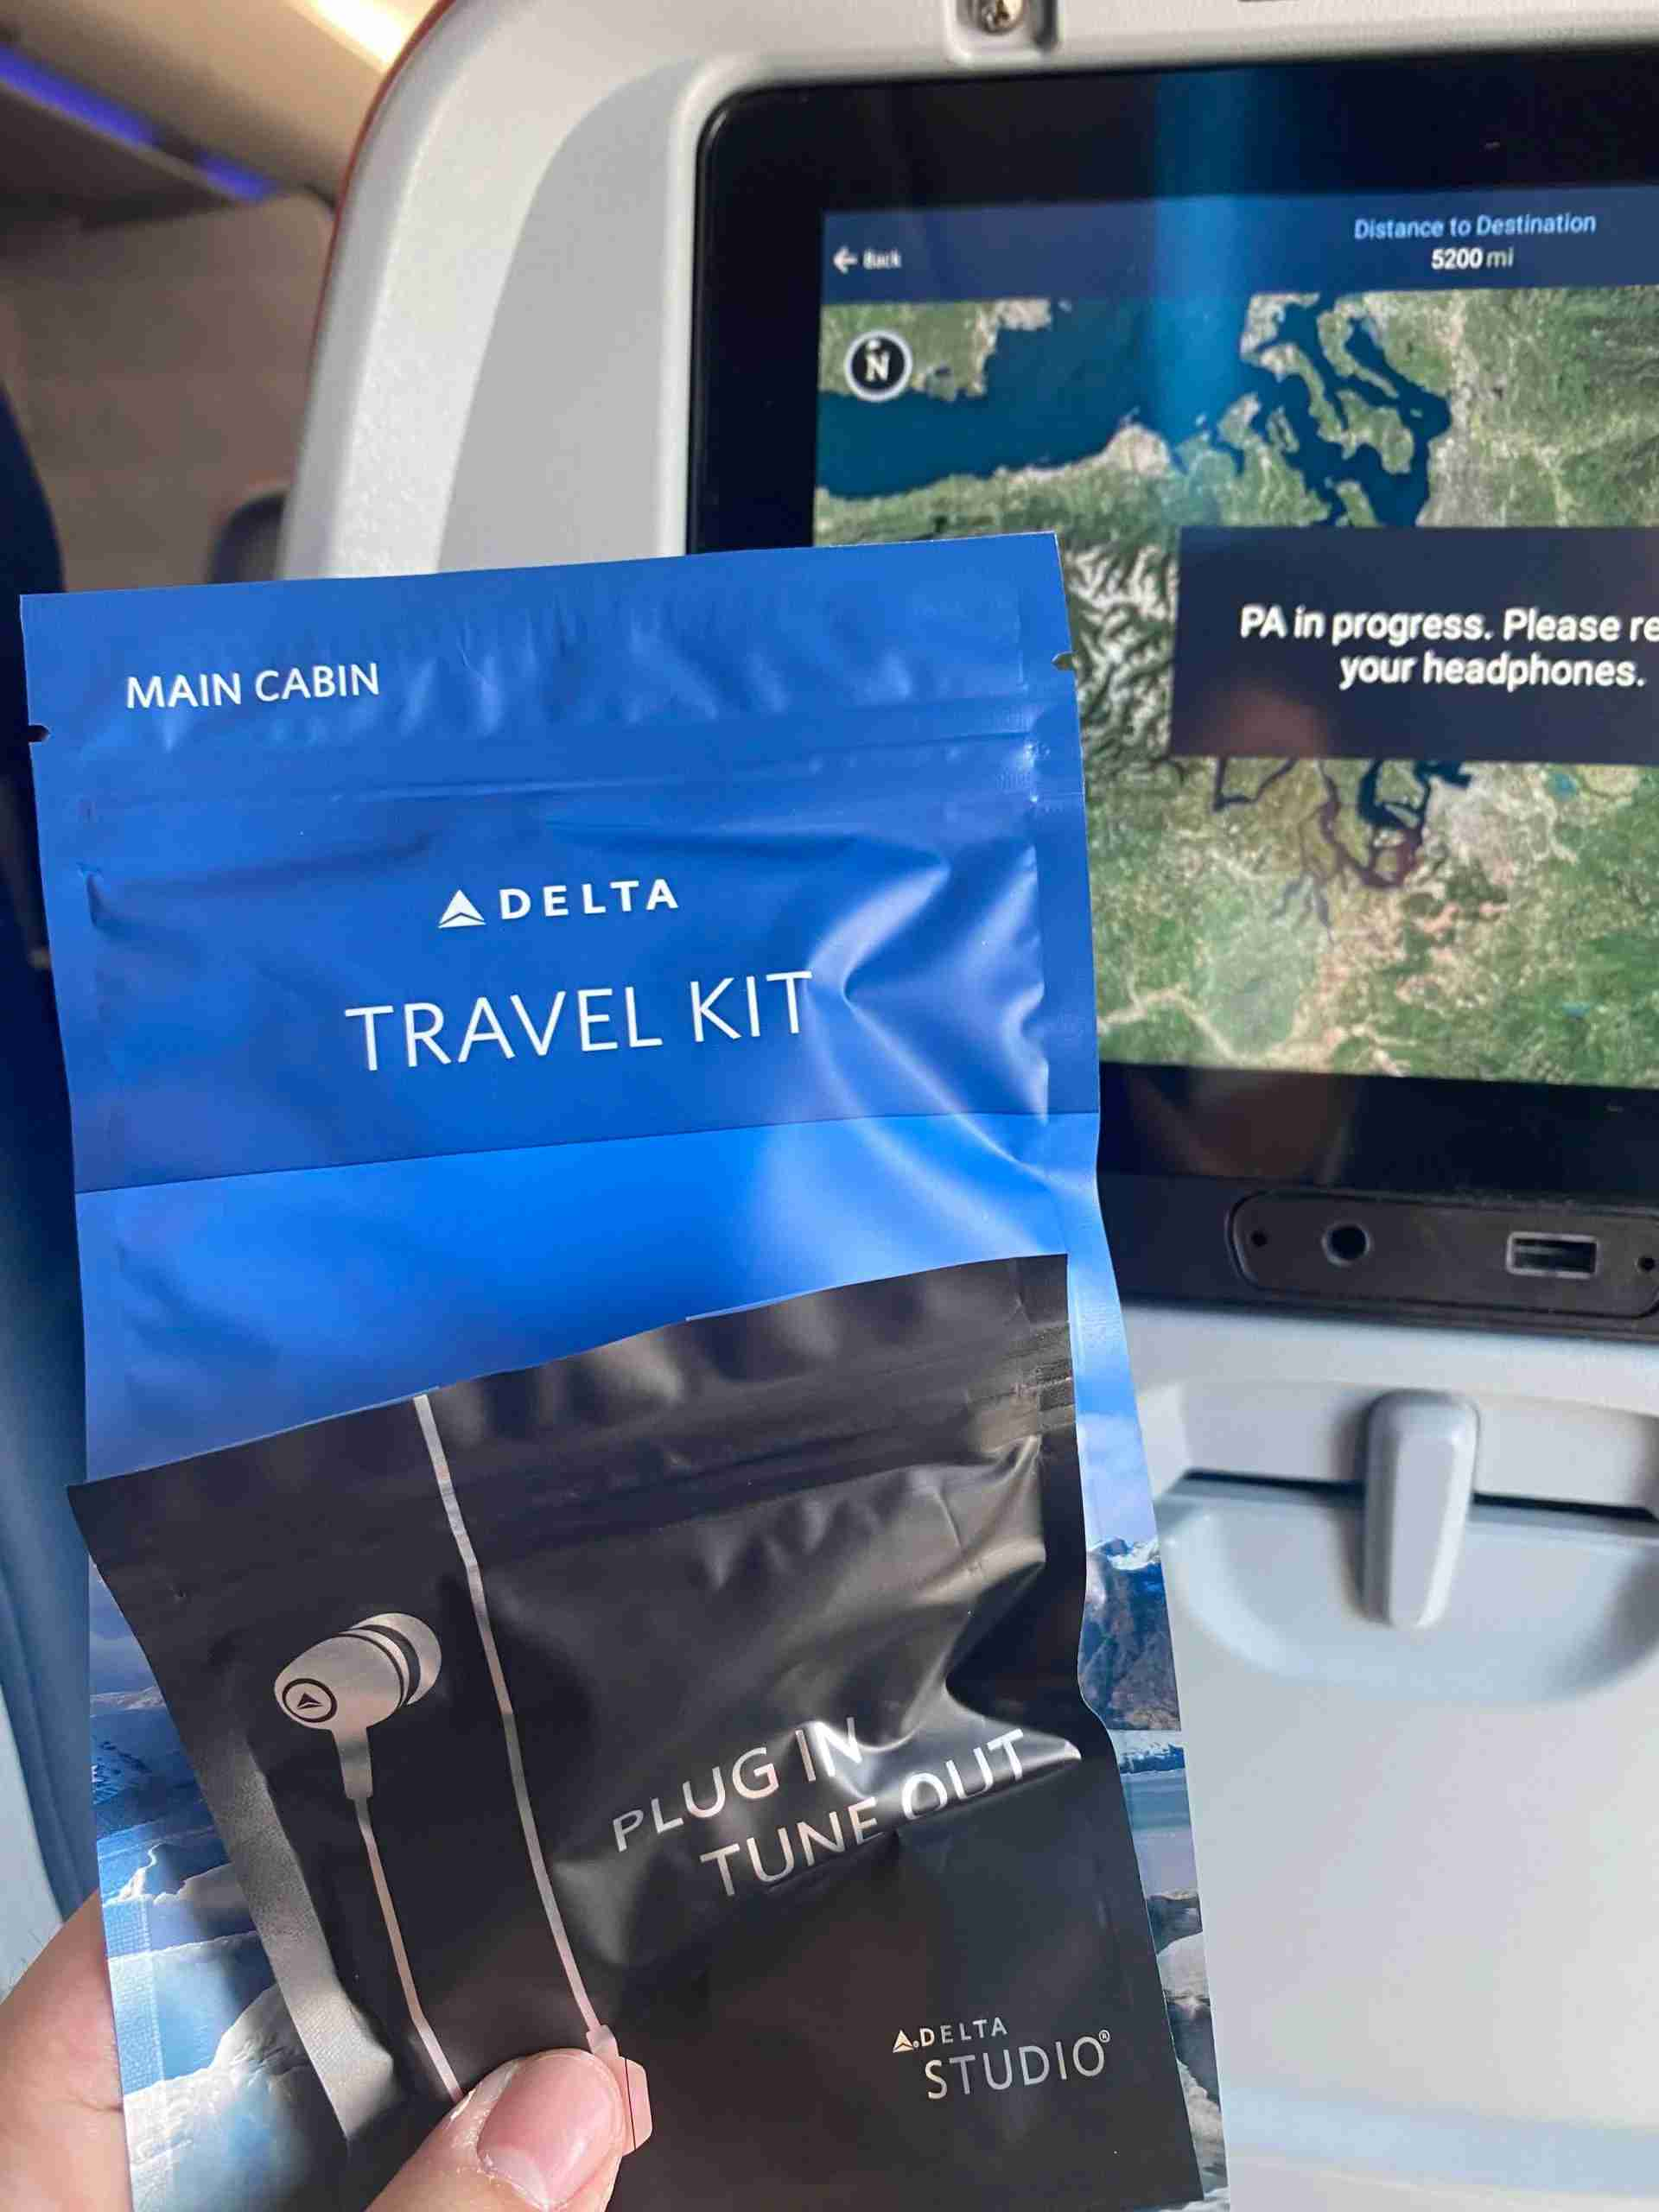 Delta Main Cabin travel kit for international travel during the pandemic